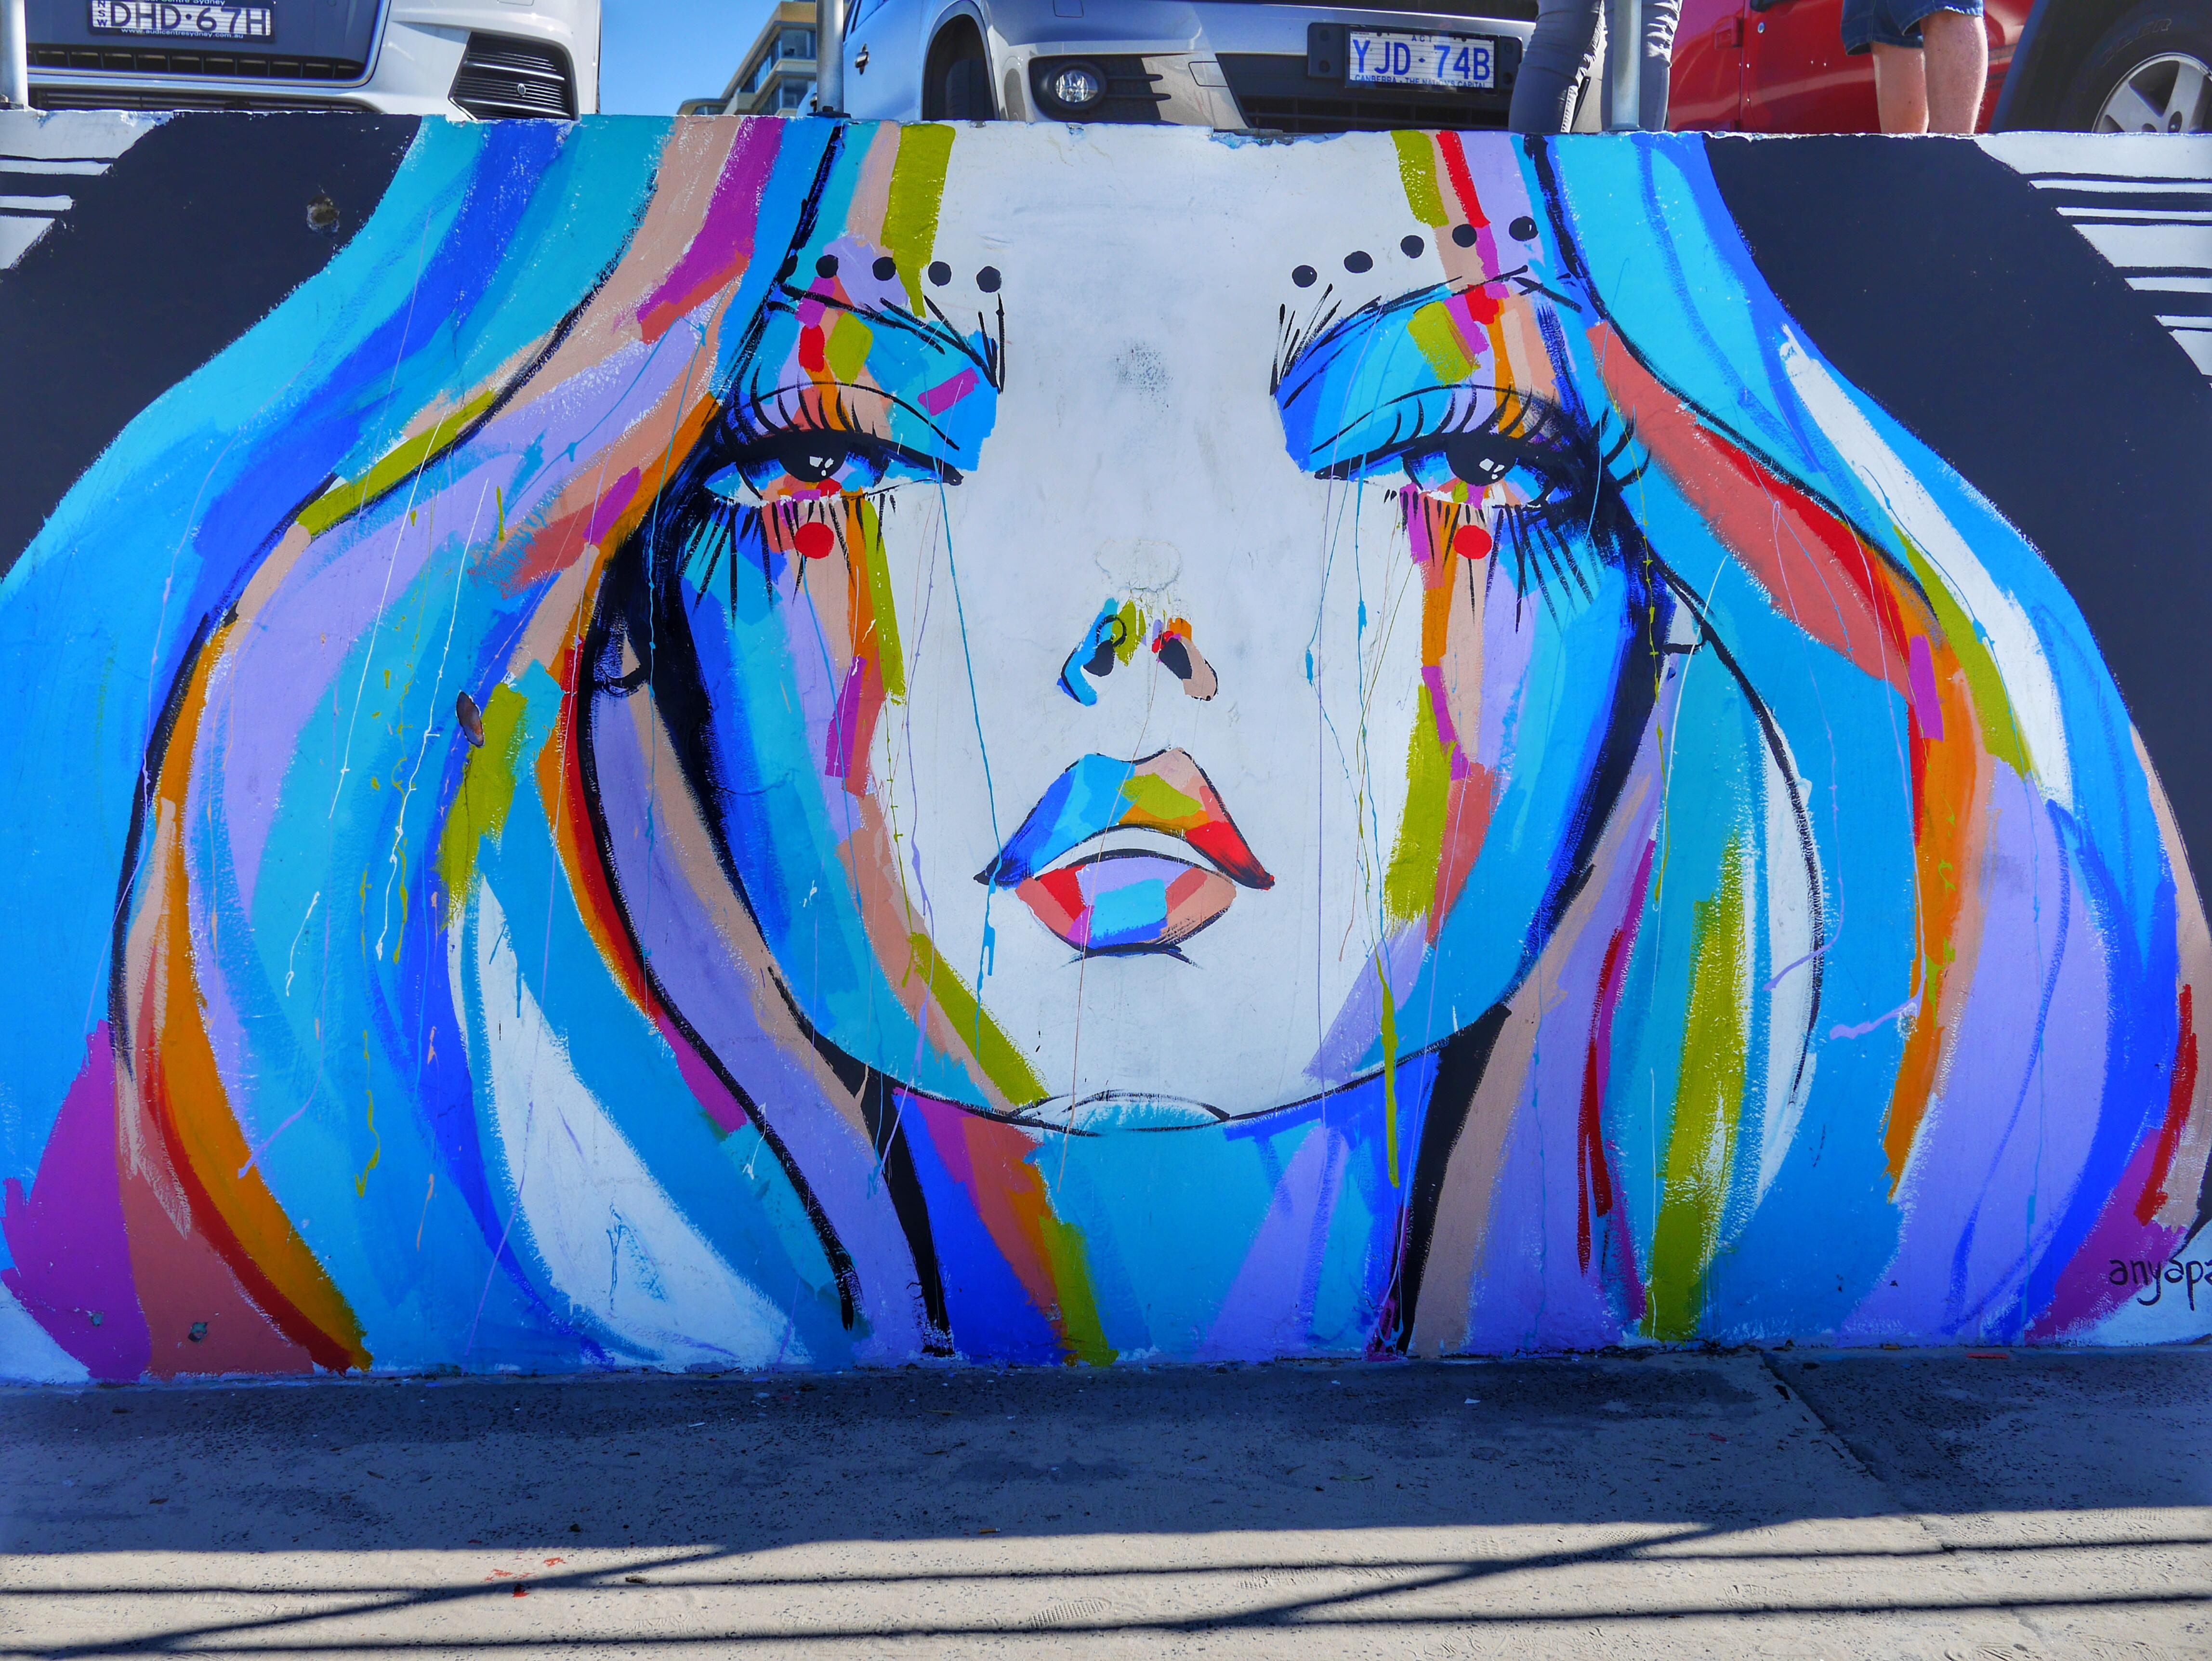 Bondi Beach street art thesweetwanderlust.com